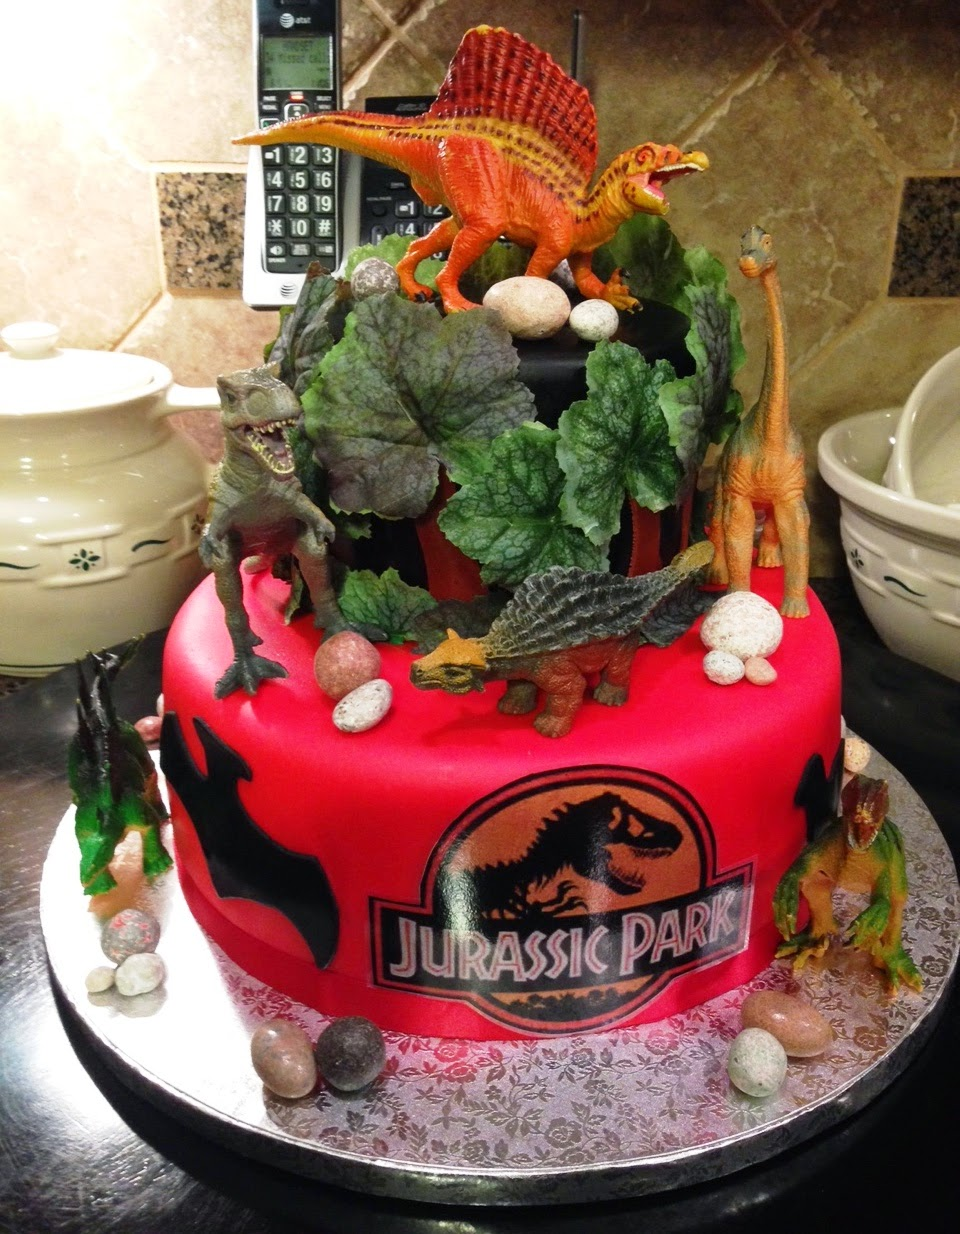 Jurassic Park Cake Ideas Amazon Com Jurassic Park Cake